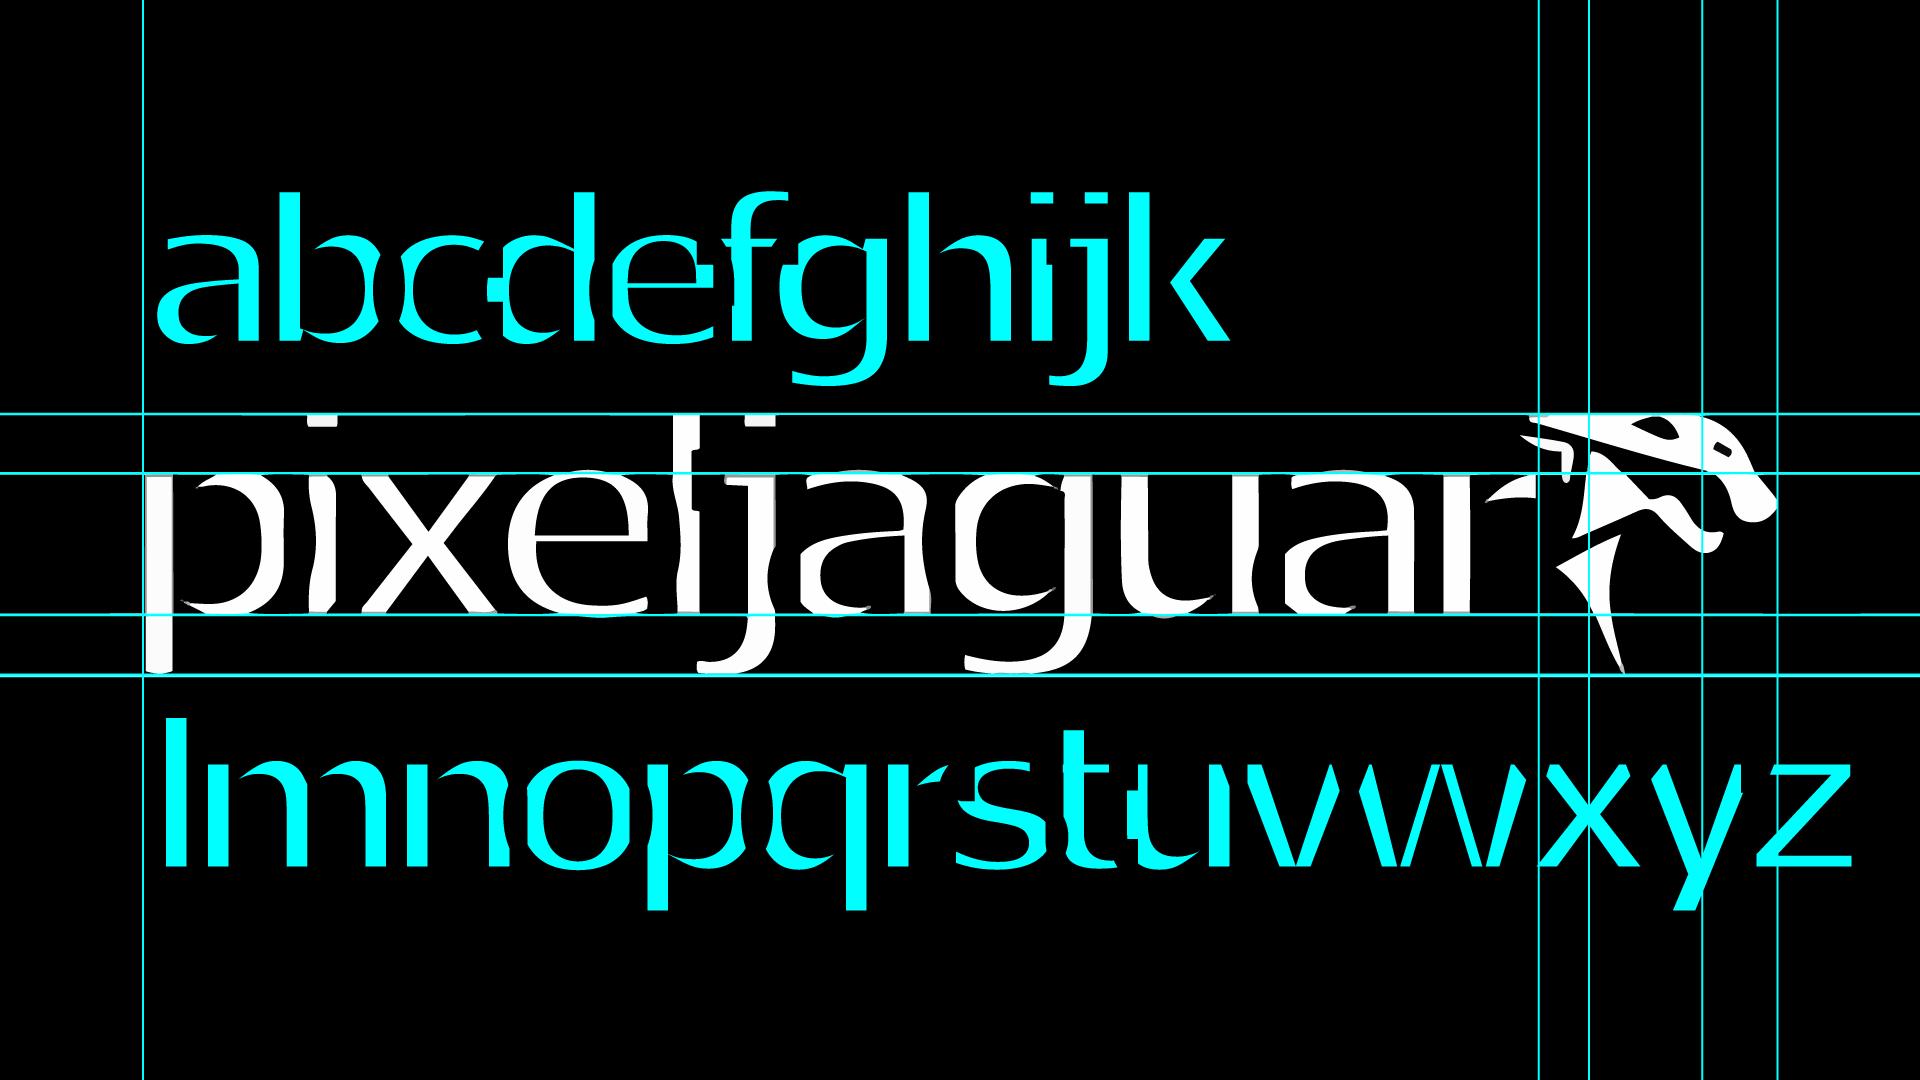 front-logo-graphic-design-studio-pixeljaguar-20-by-elj